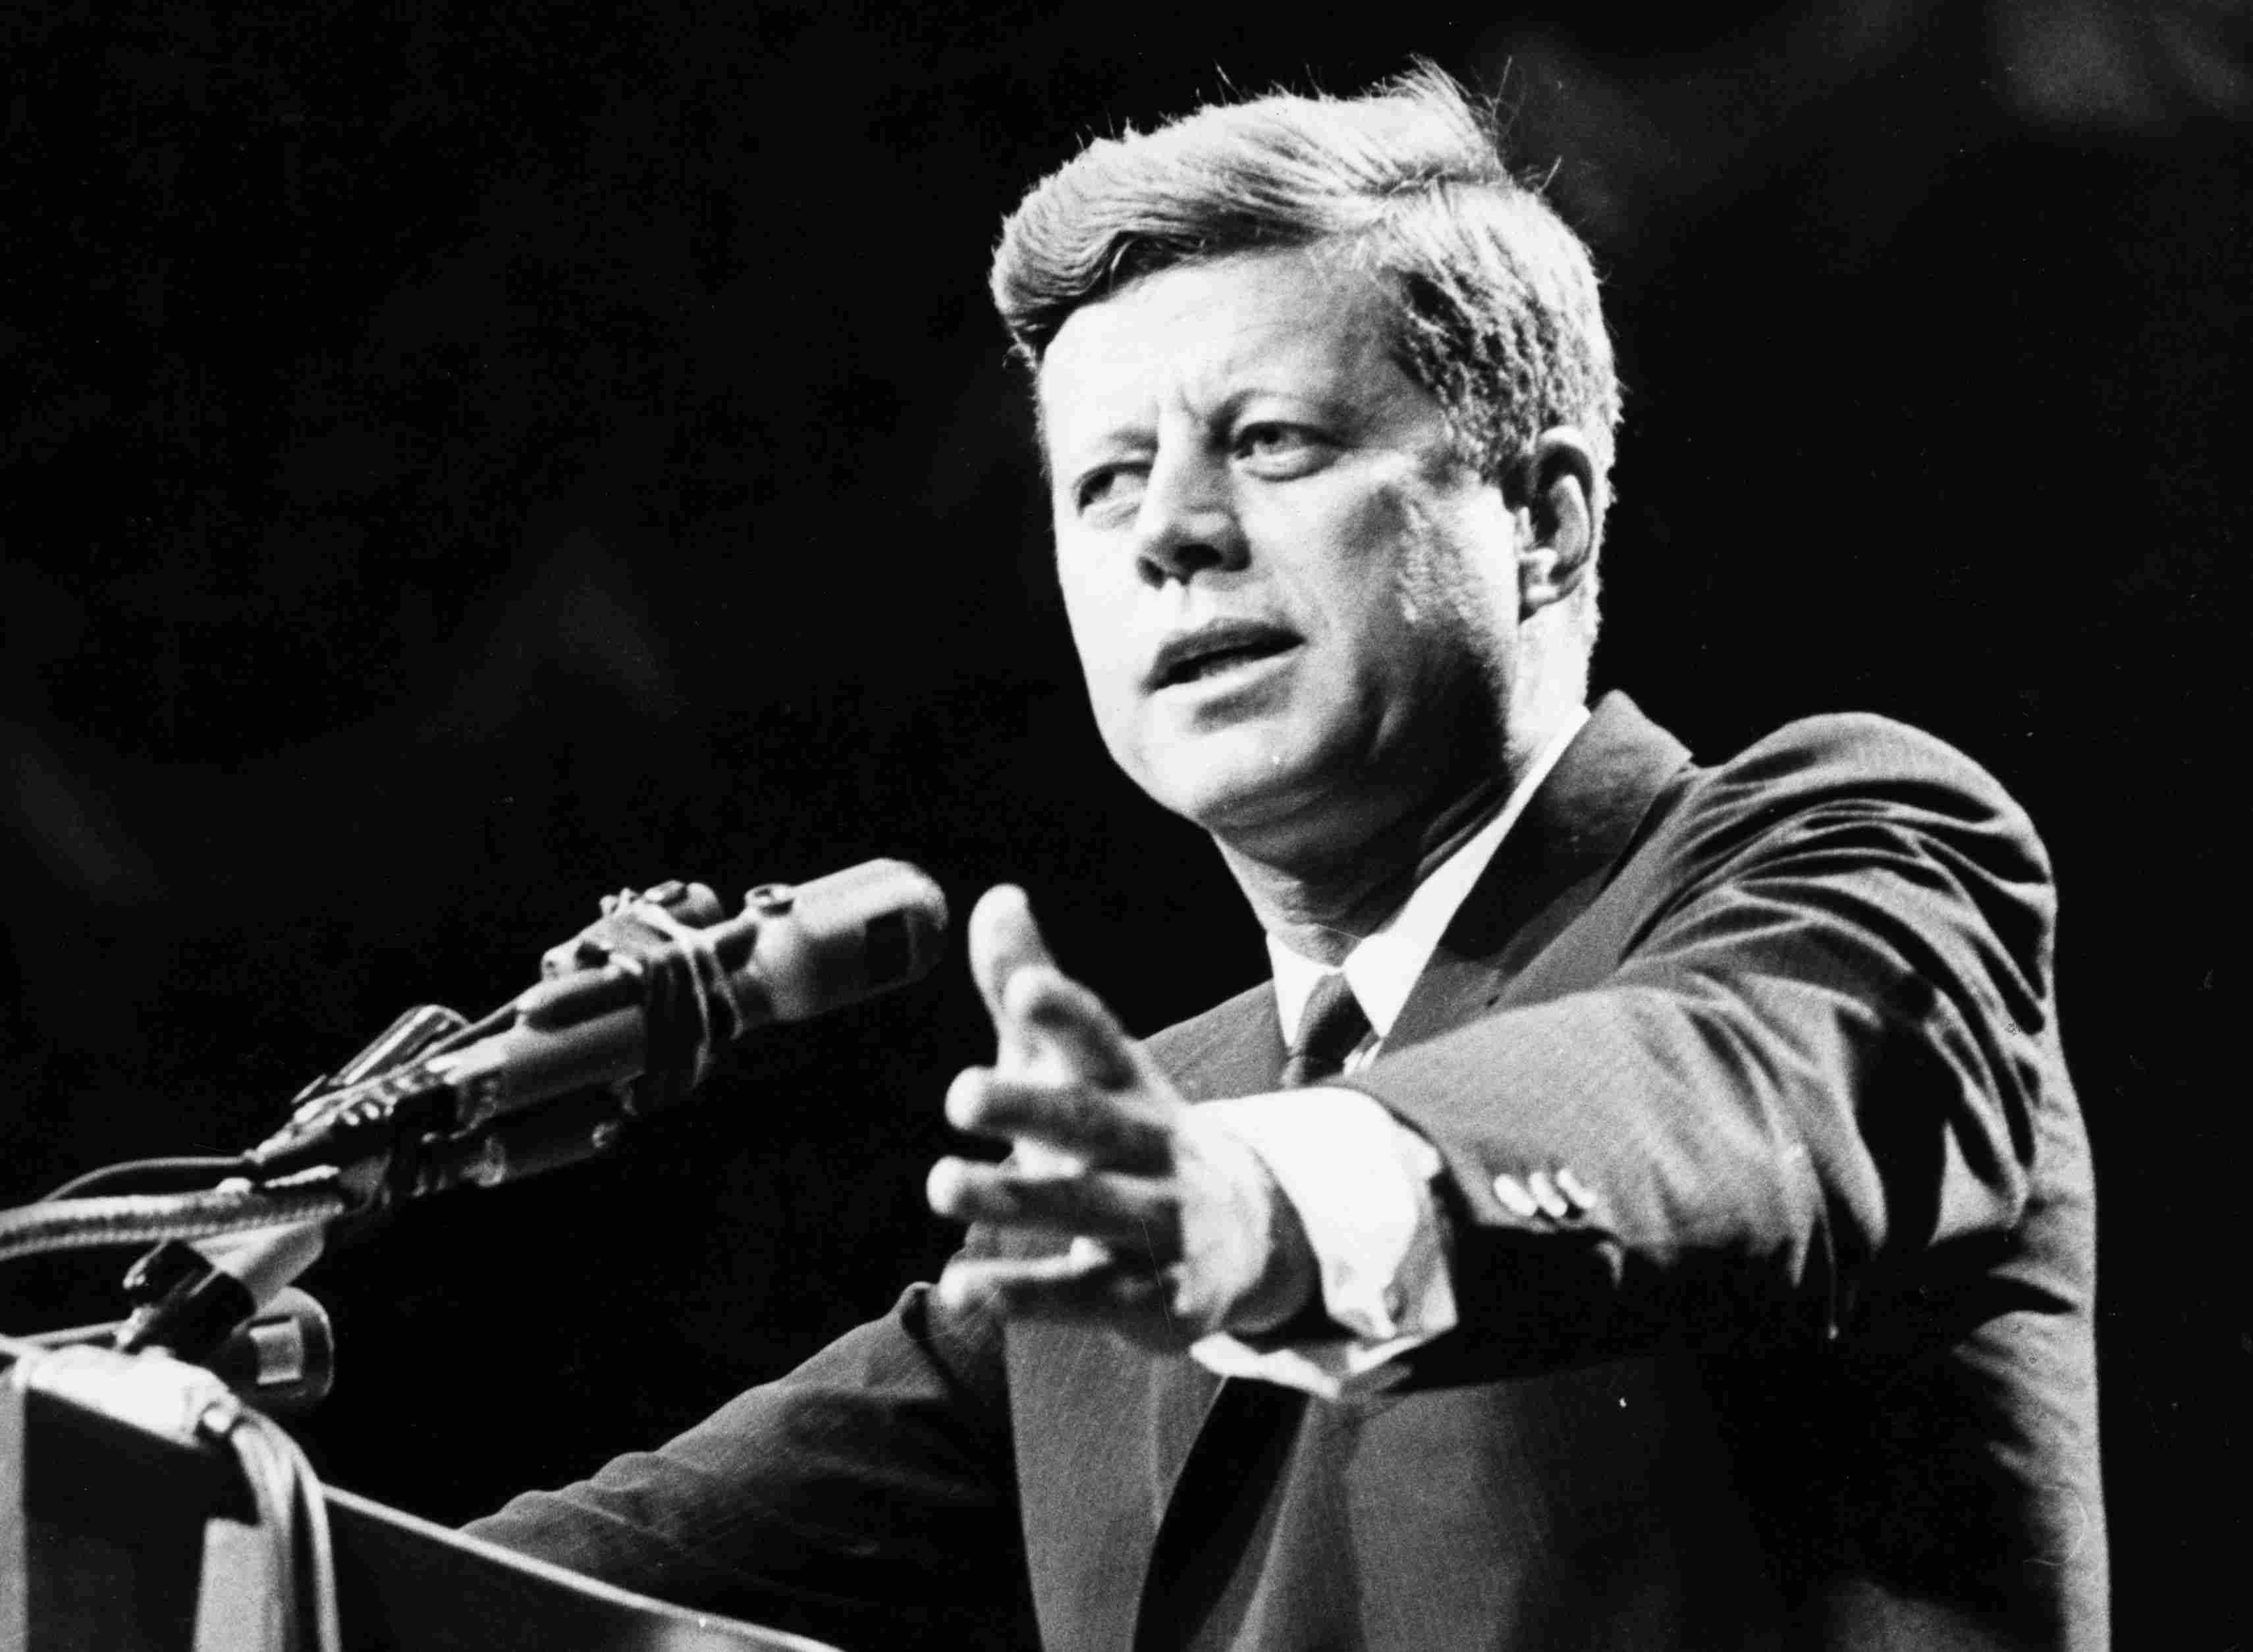 President Kennedy